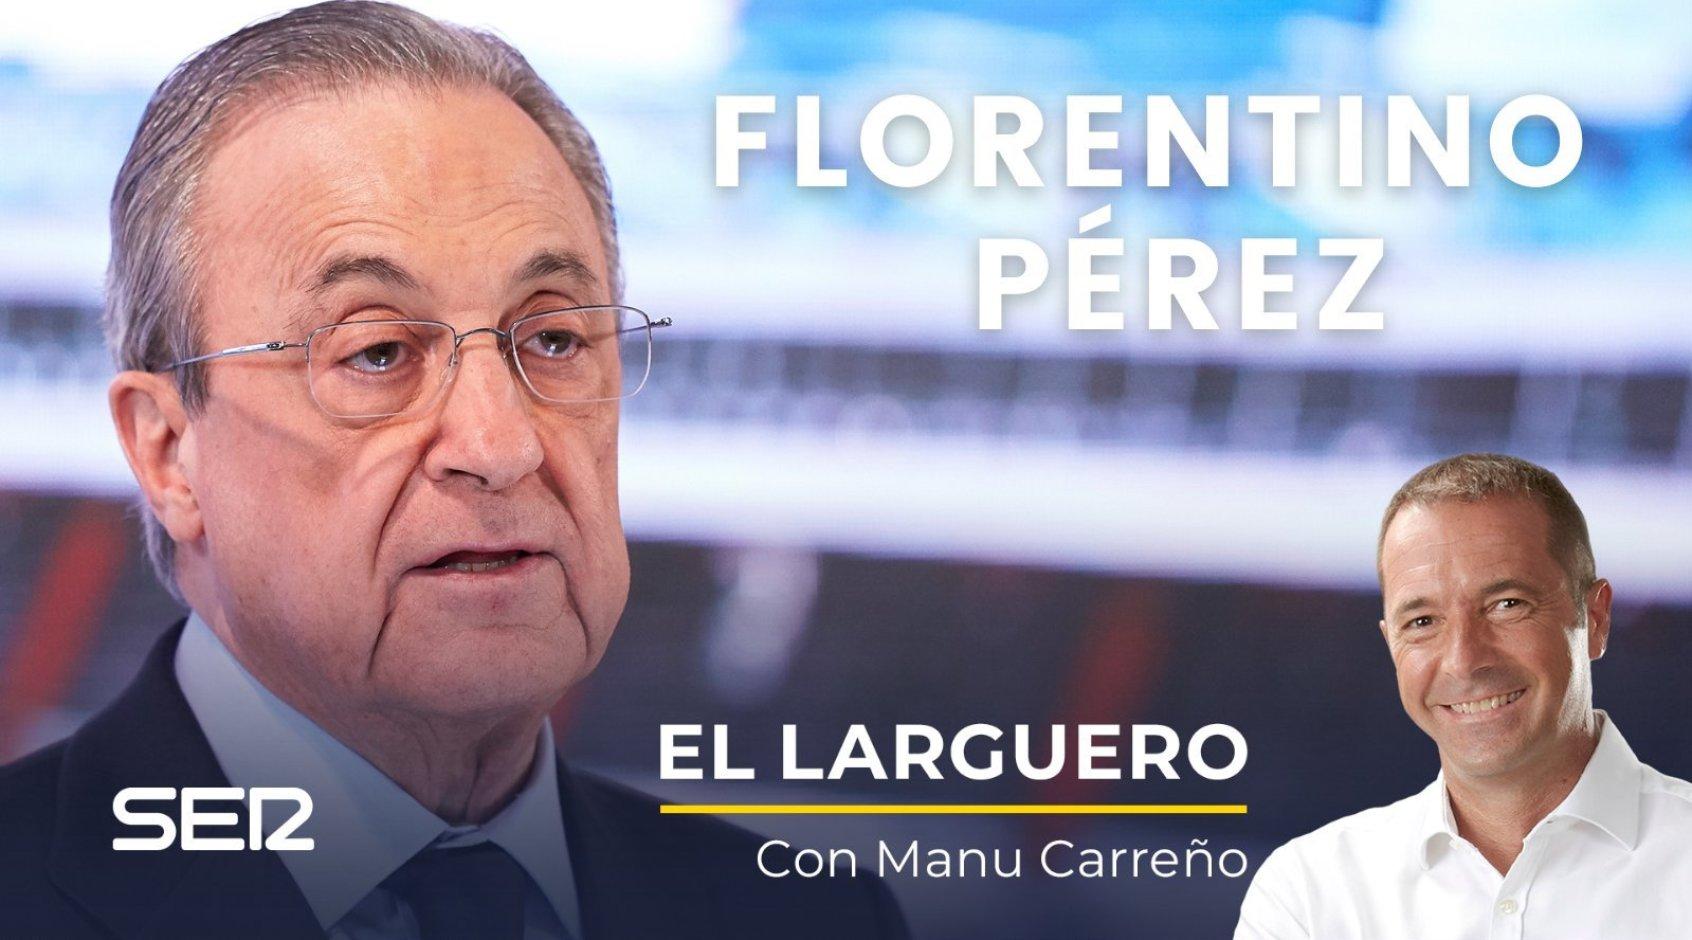 Флорентино Перес - о провале Суперлиги